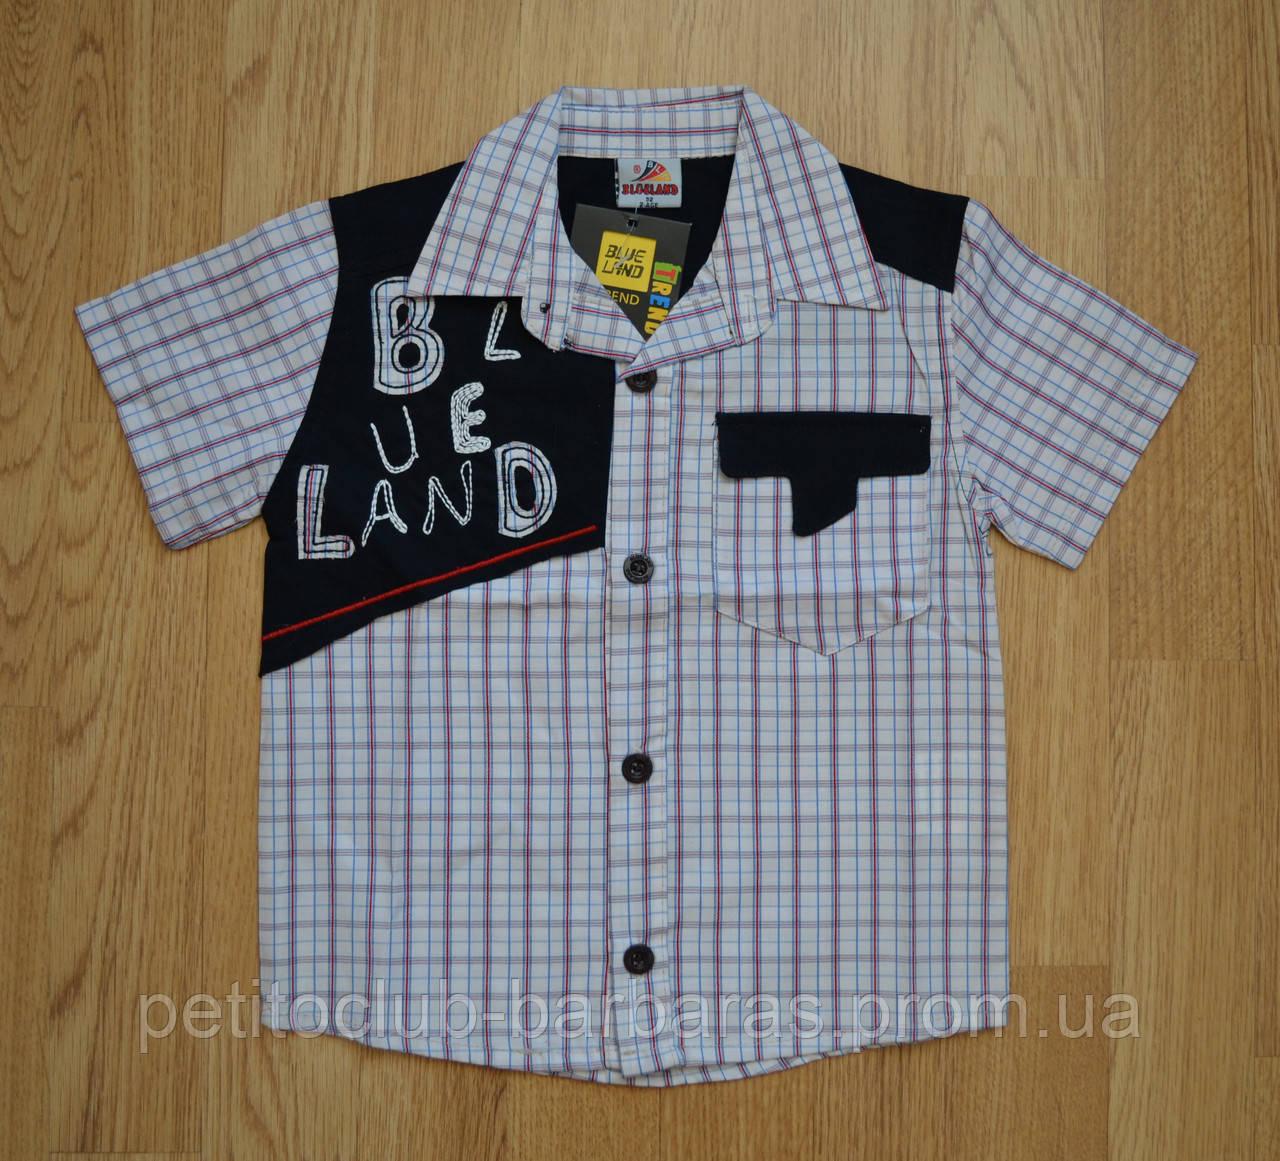 Рубашка для мальчика с коротким рукавом BLD р. 92, 98 см (Турция)